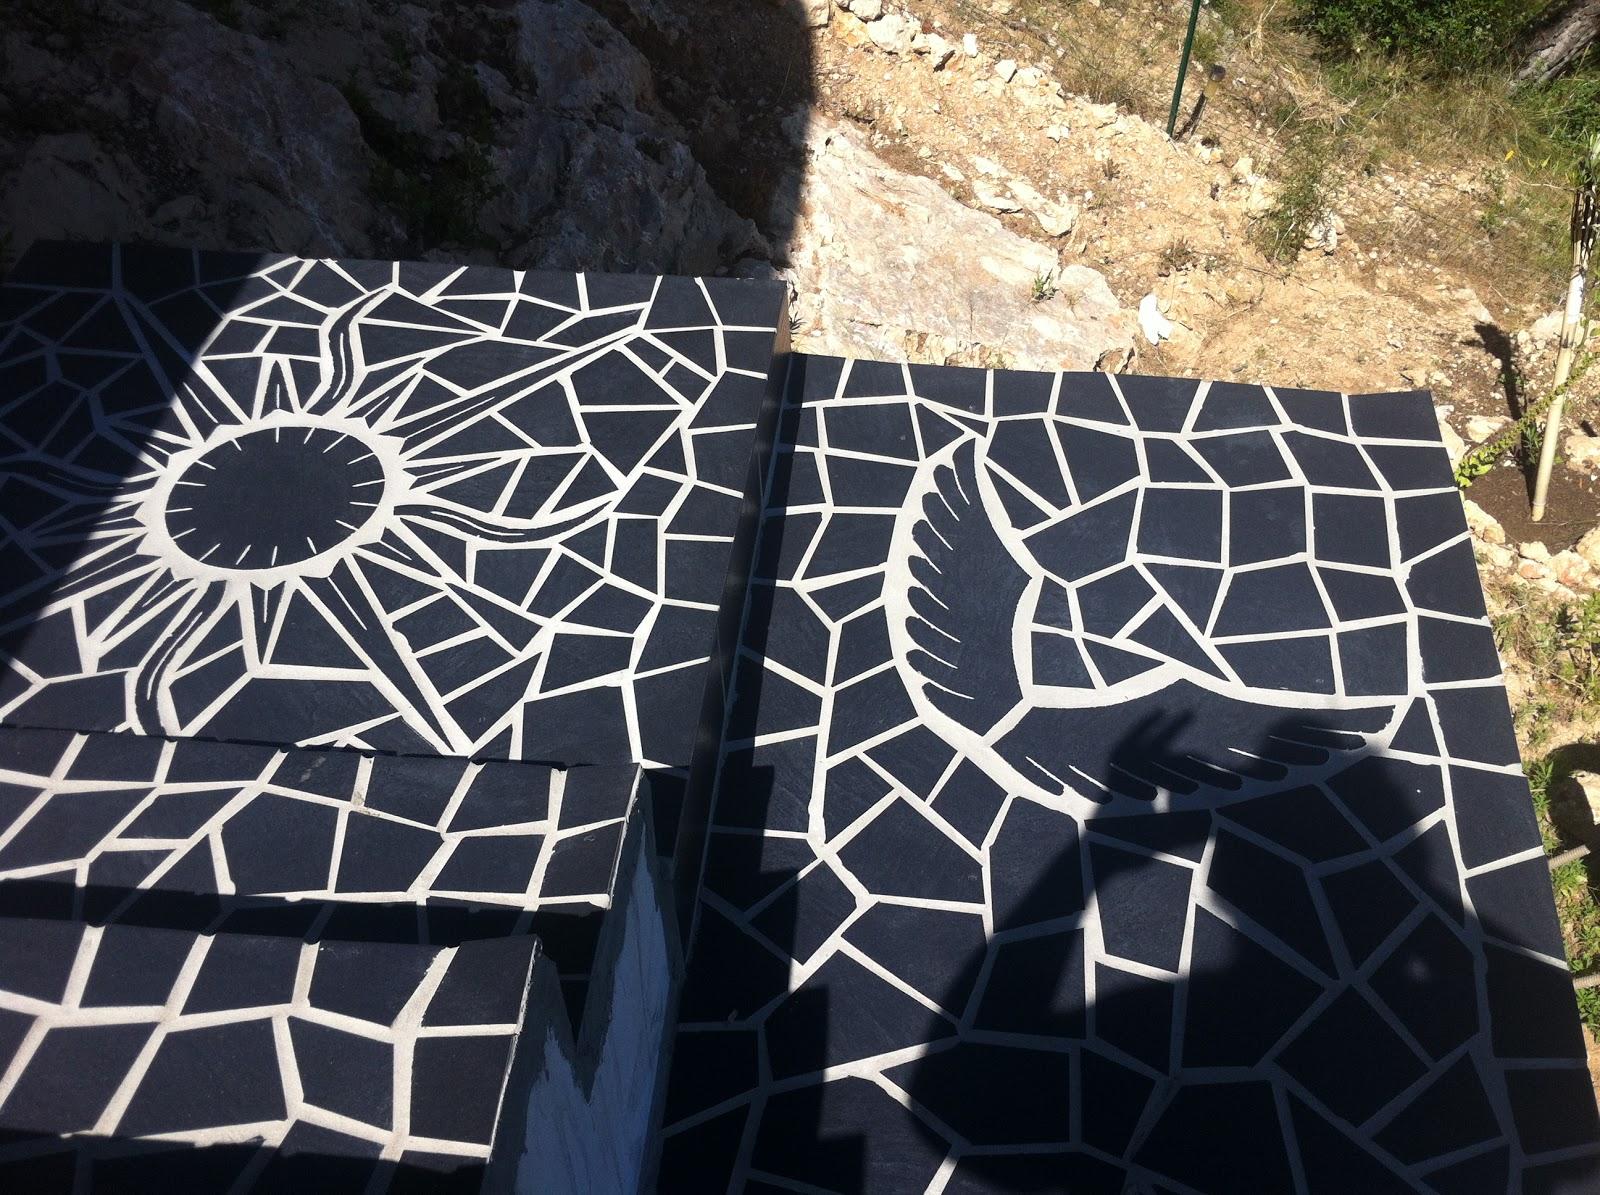 agencement et cr ation terrasses et mosa que. Black Bedroom Furniture Sets. Home Design Ideas